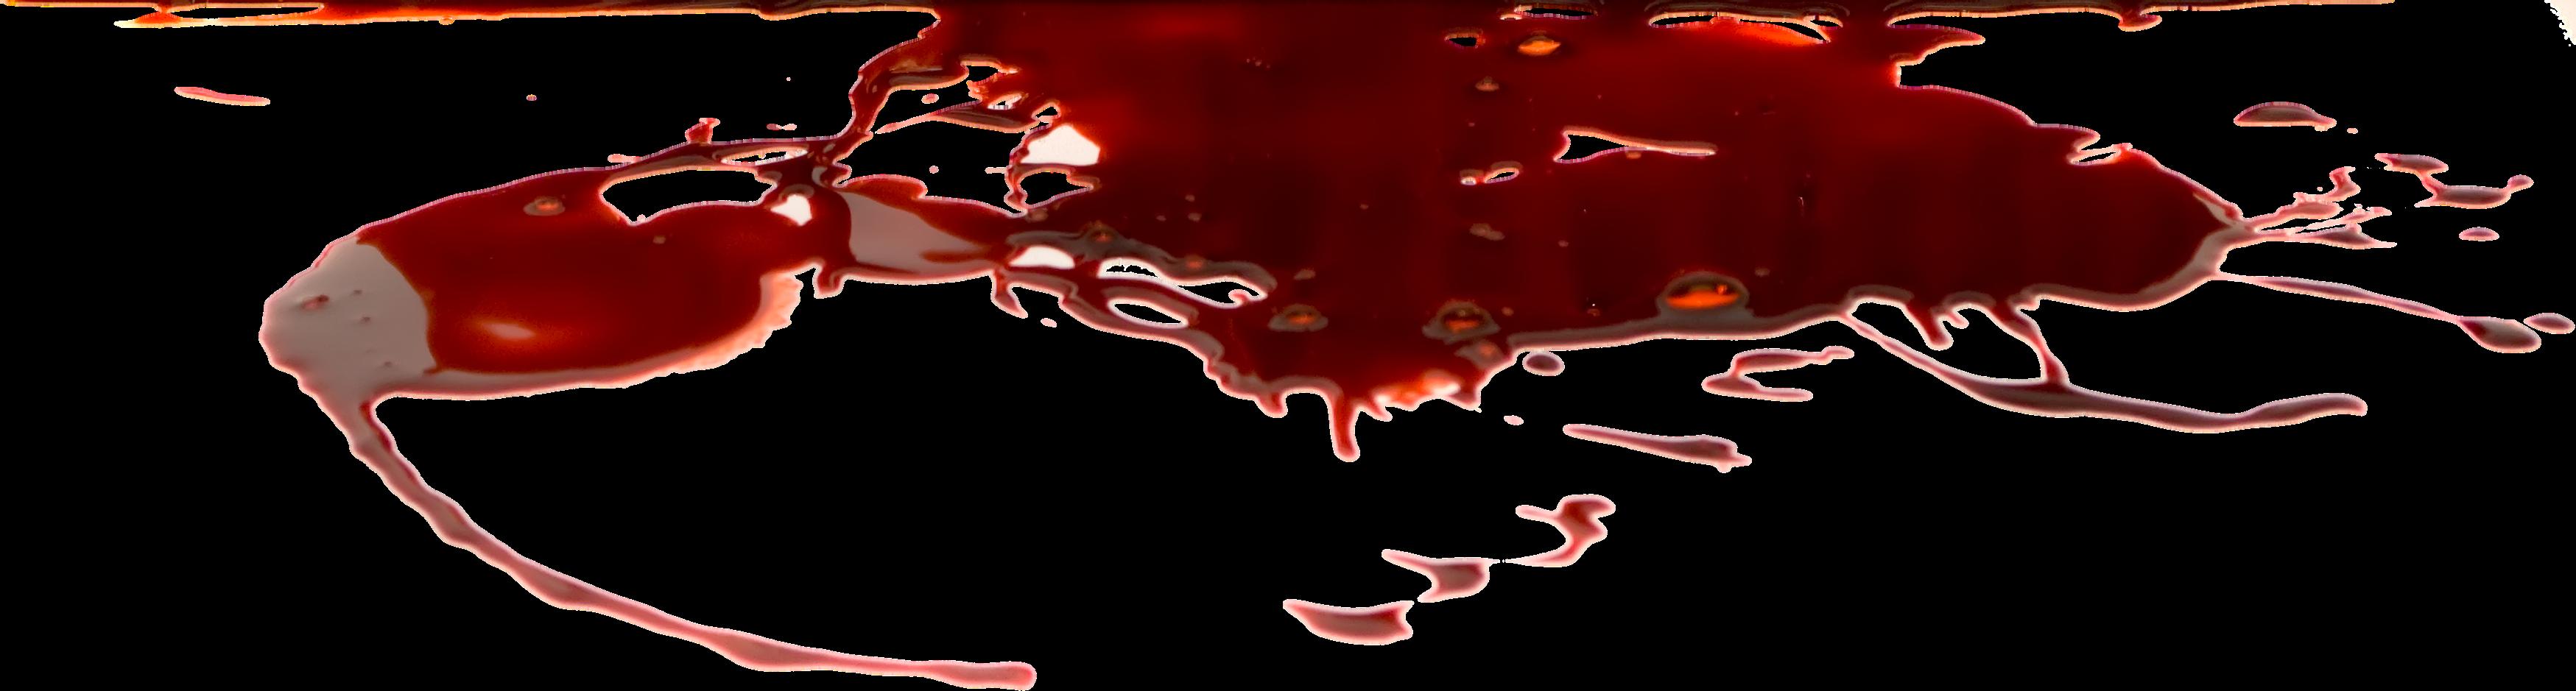 Images free download splashes. Png blood